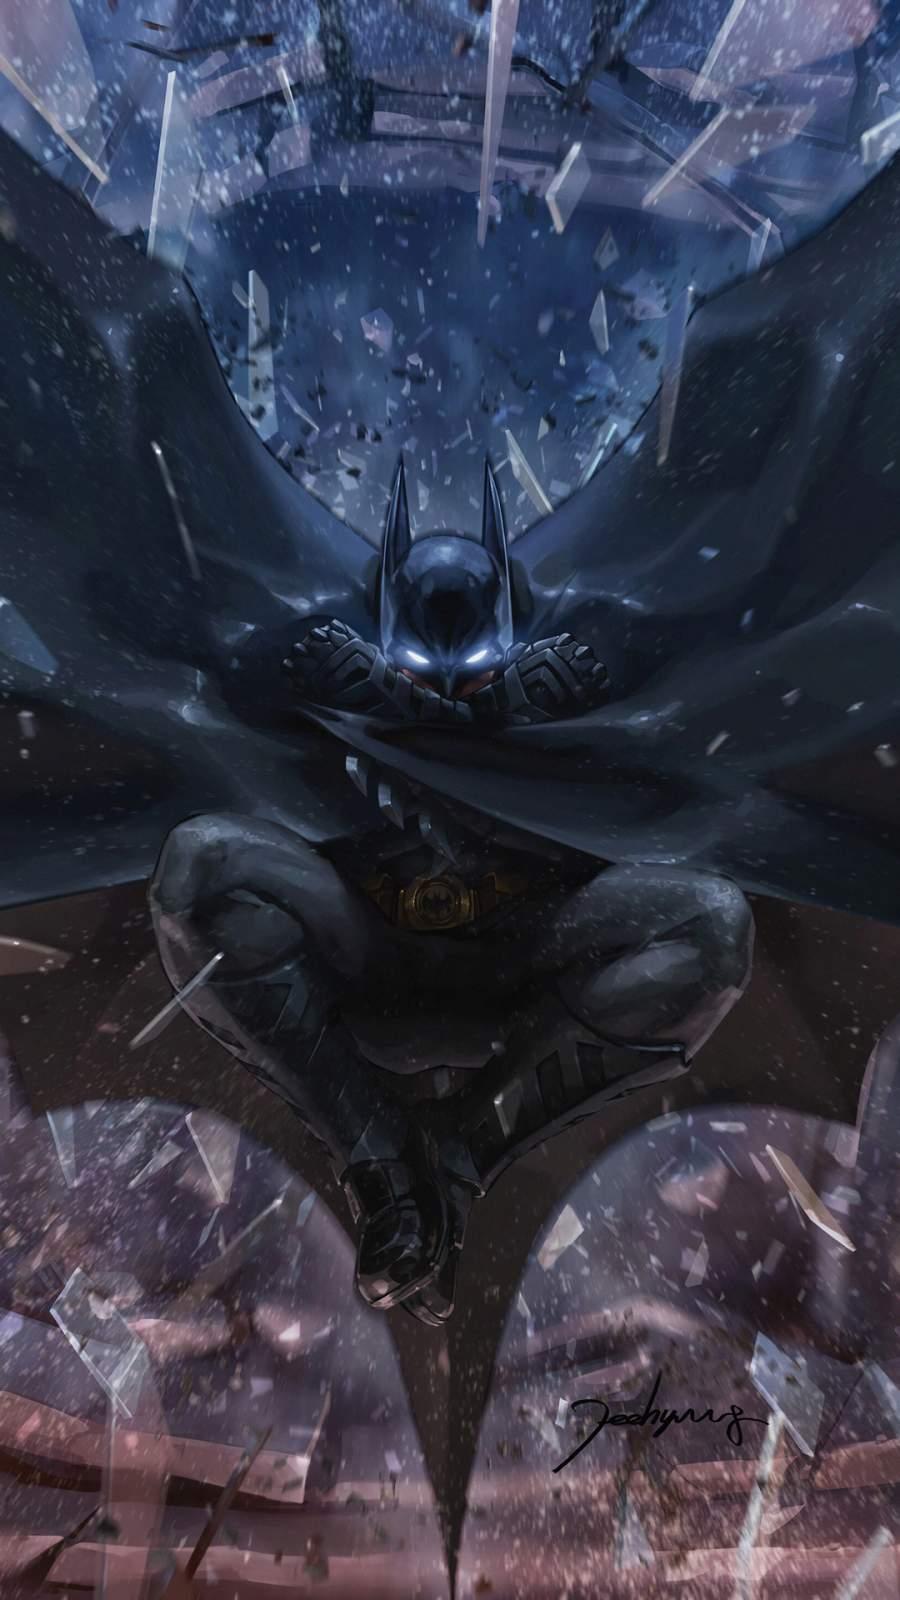 Batman Grave iPhone Wallpaper